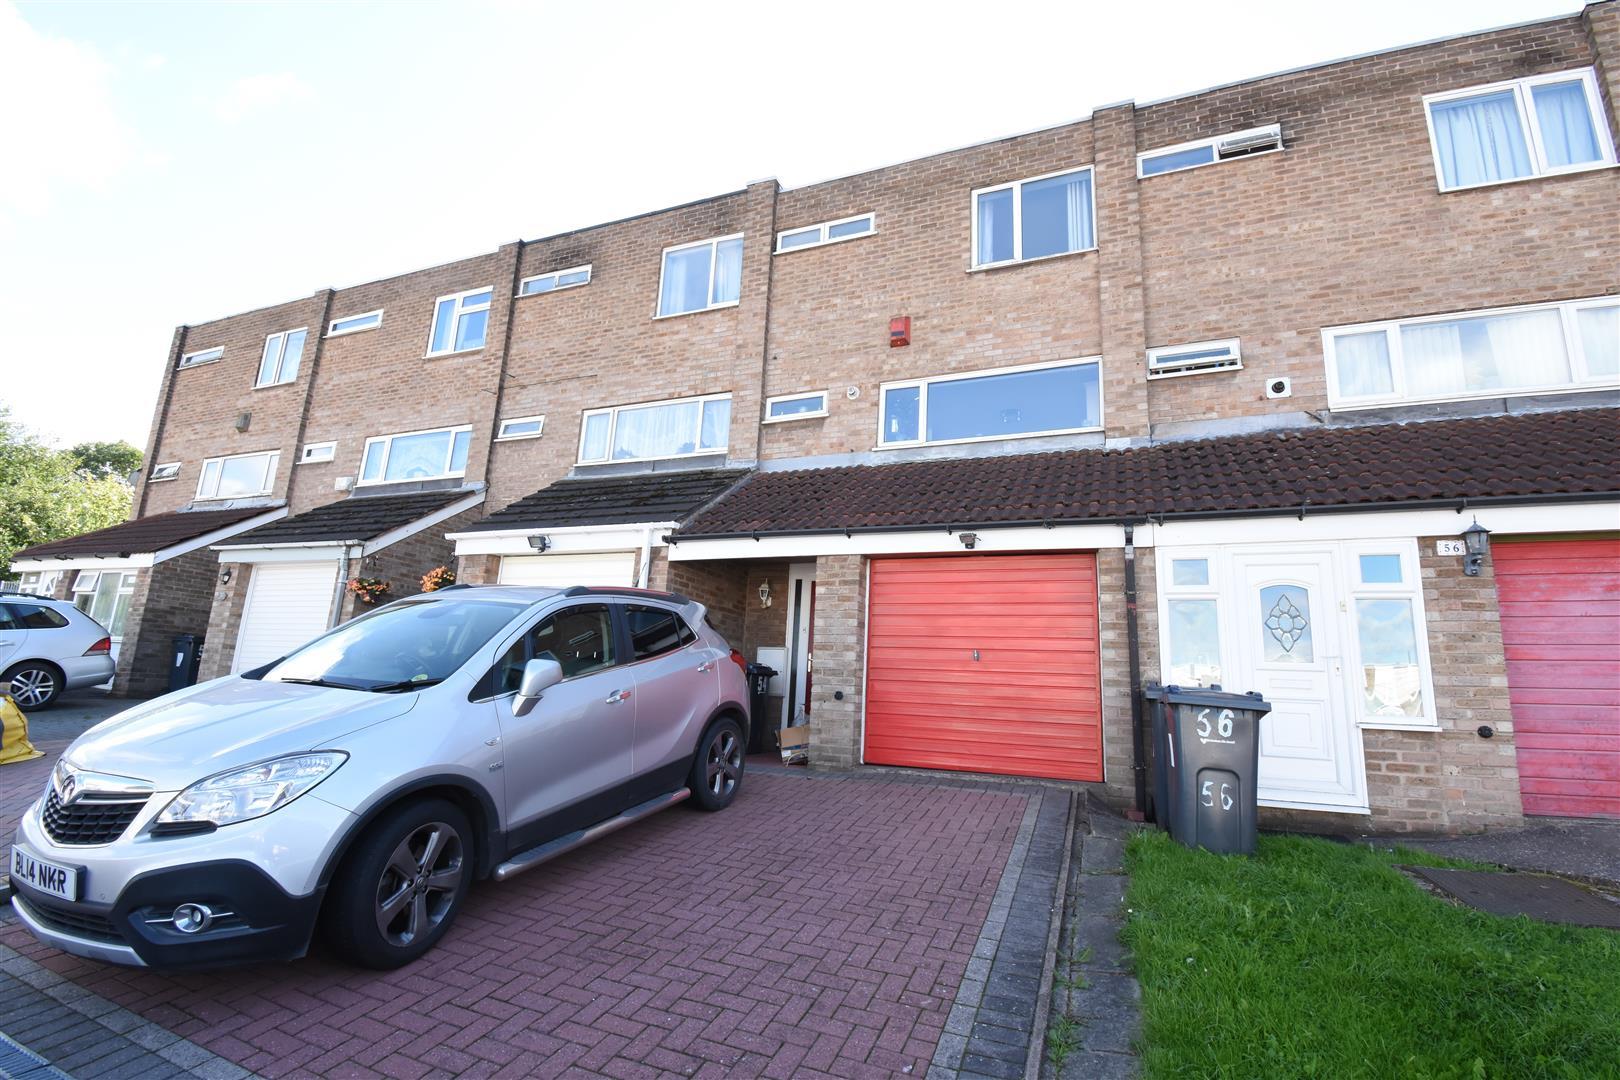 3 bed house for sale in Kempton Park Road, Bromford Bridge, Birmingham, B36